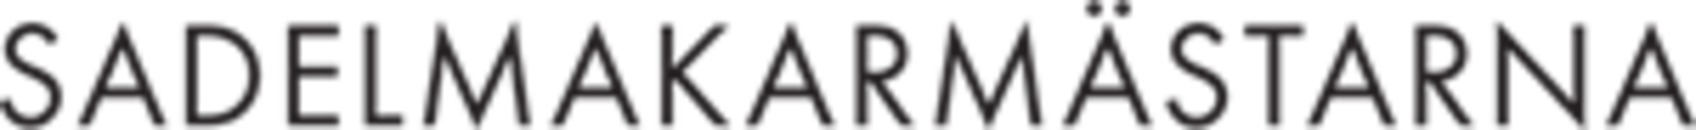 Sadelmakarmästarna AB Läder & Inredningar logo